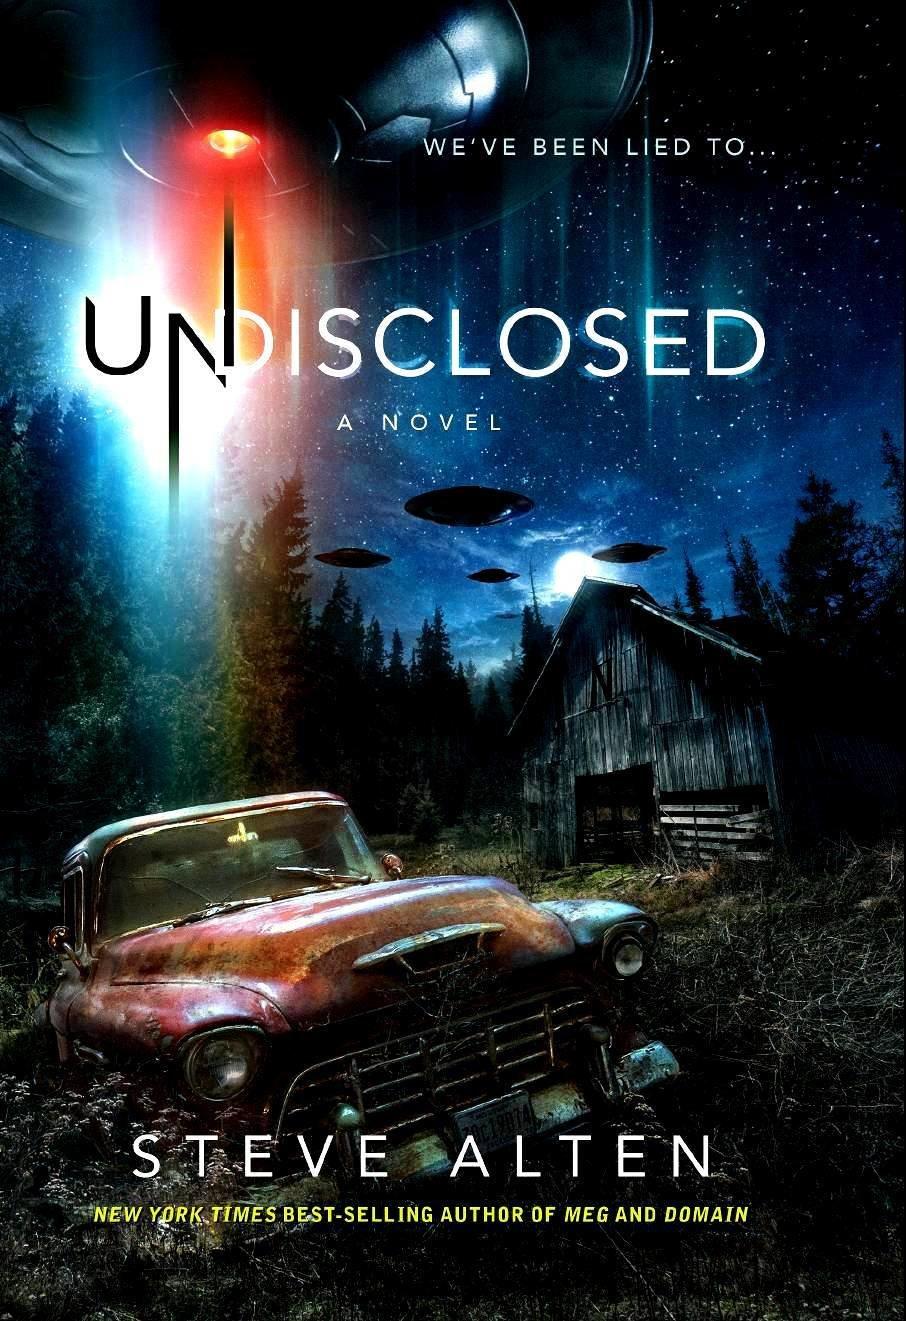 UNDISCLOSED First Edition Hardbacks